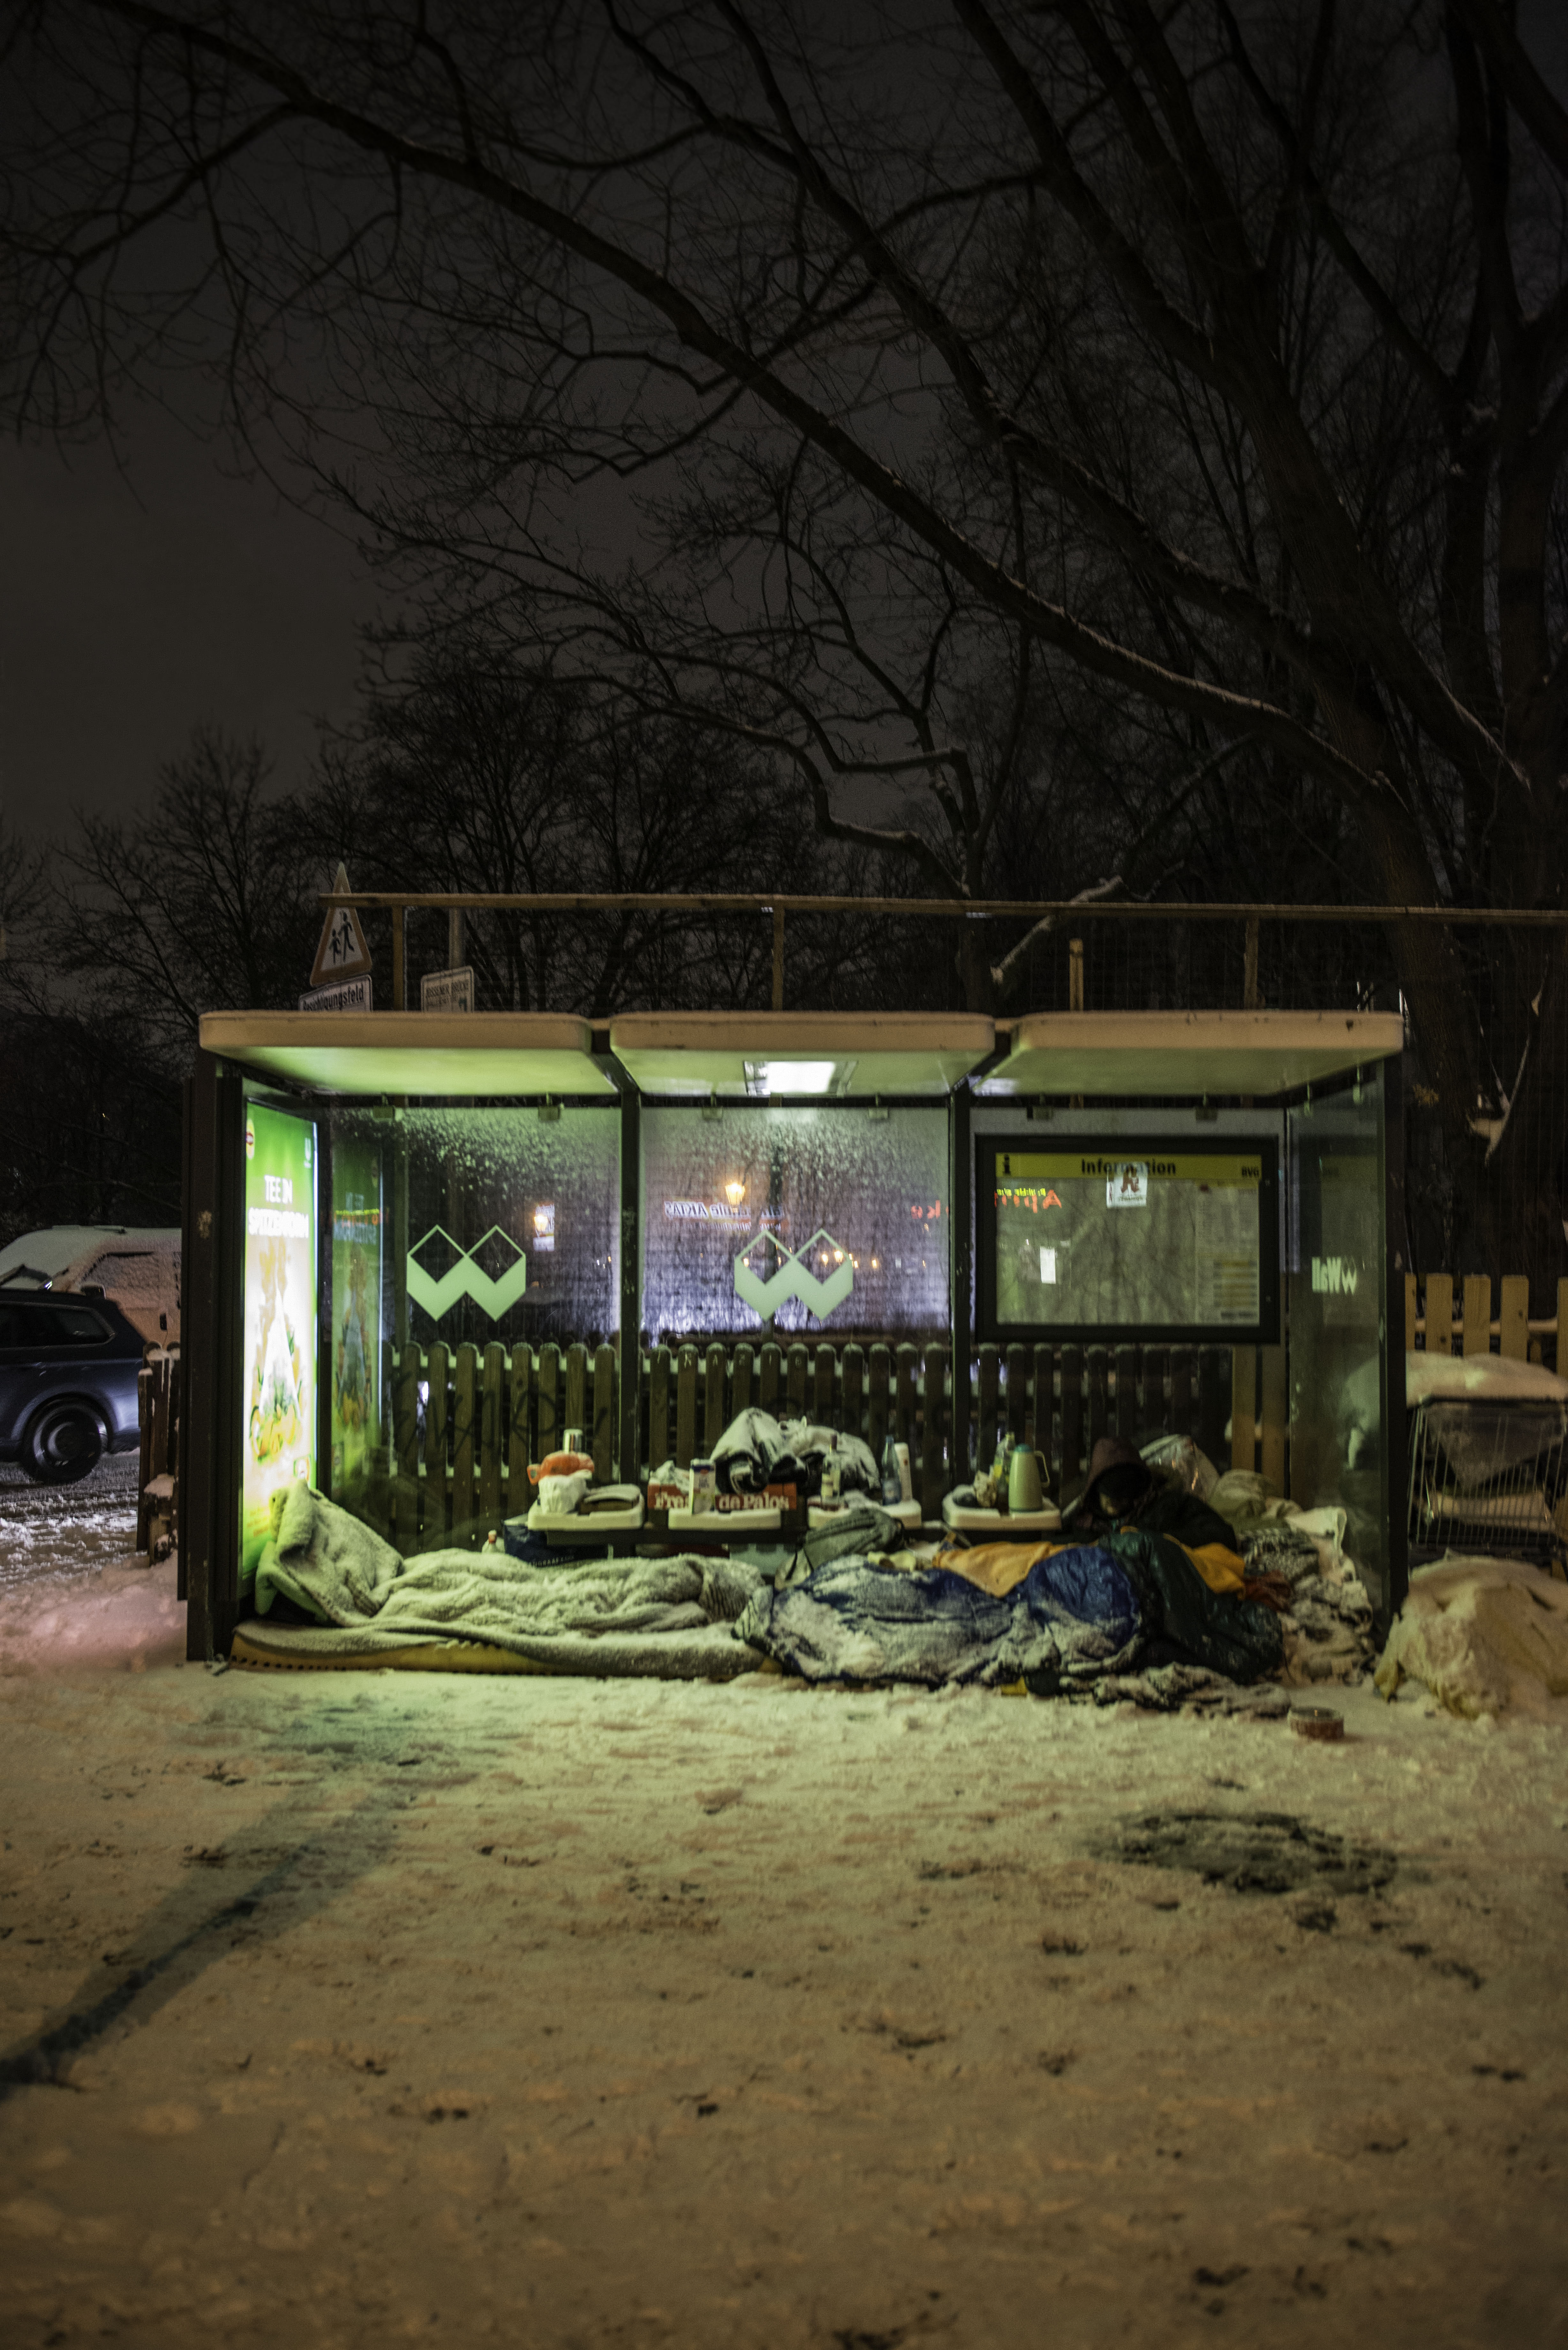 24 stunden berleben obdachlose in berlin zitty. Black Bedroom Furniture Sets. Home Design Ideas